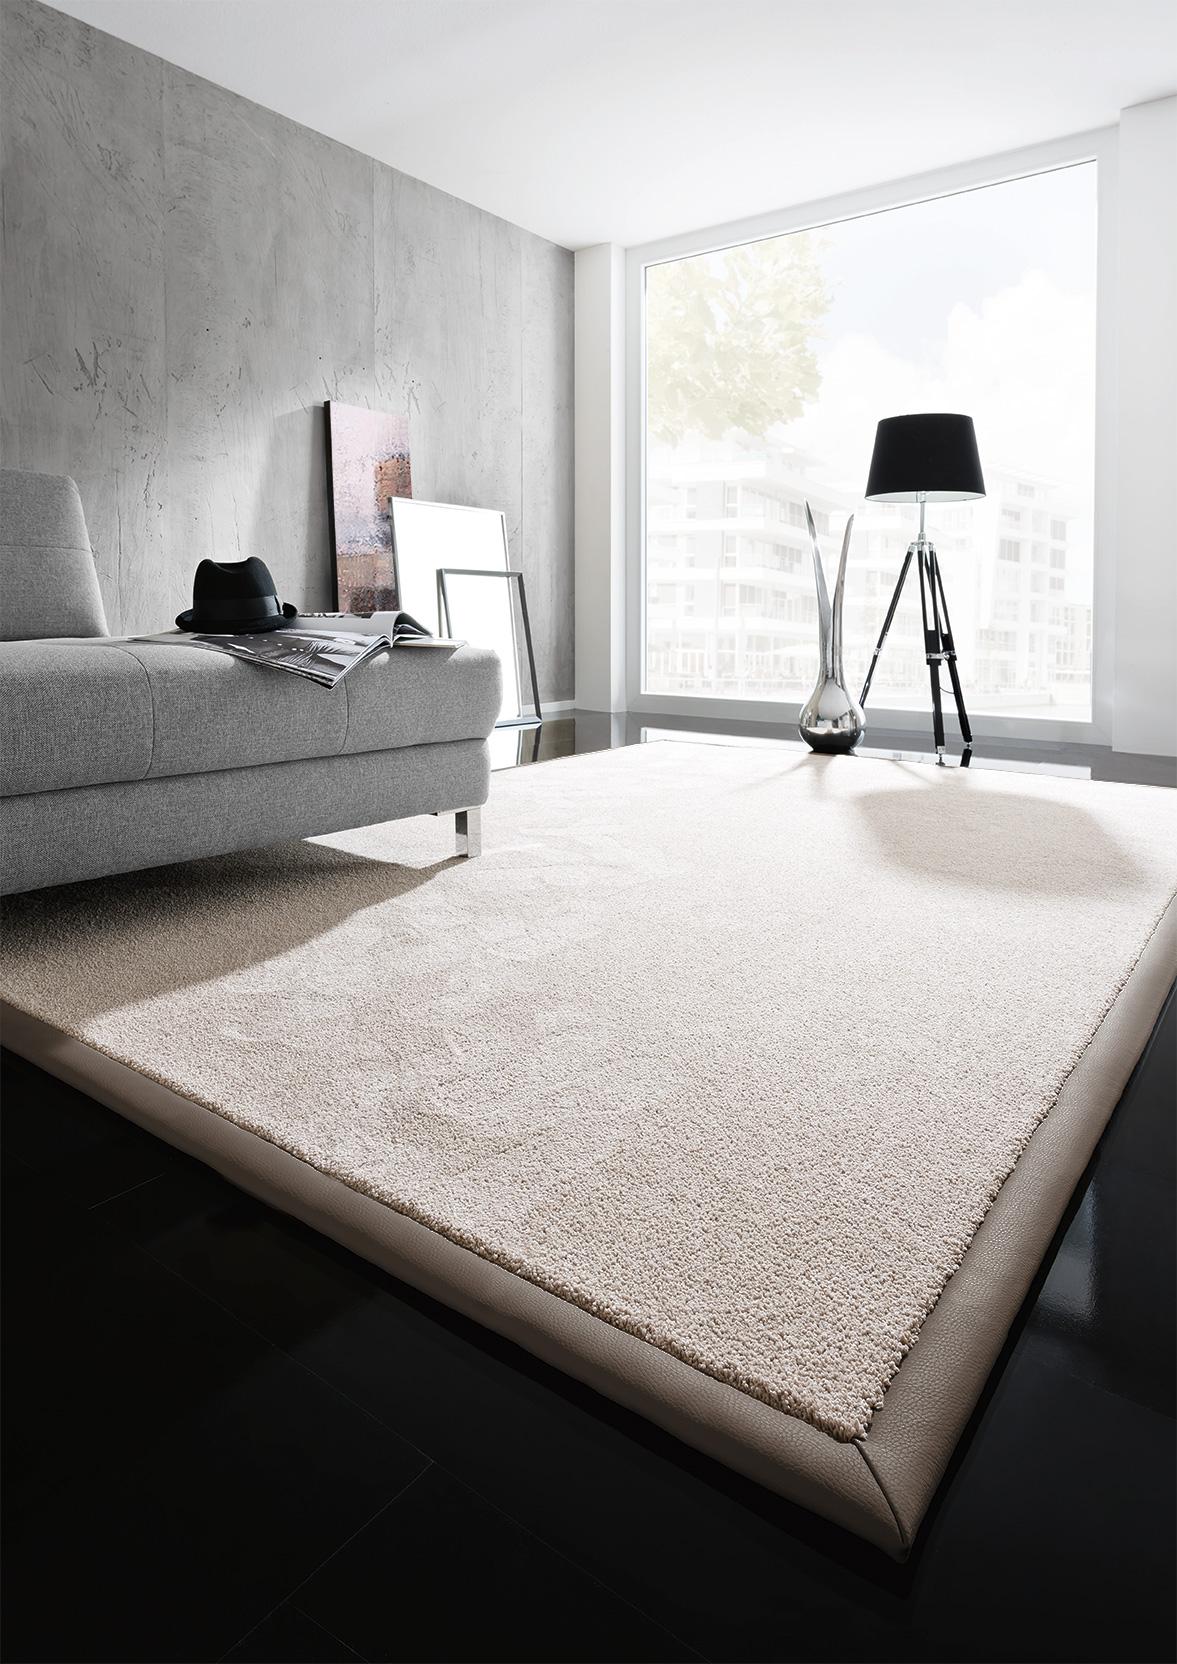 teppich ecken gl tten 13405520170921. Black Bedroom Furniture Sets. Home Design Ideas